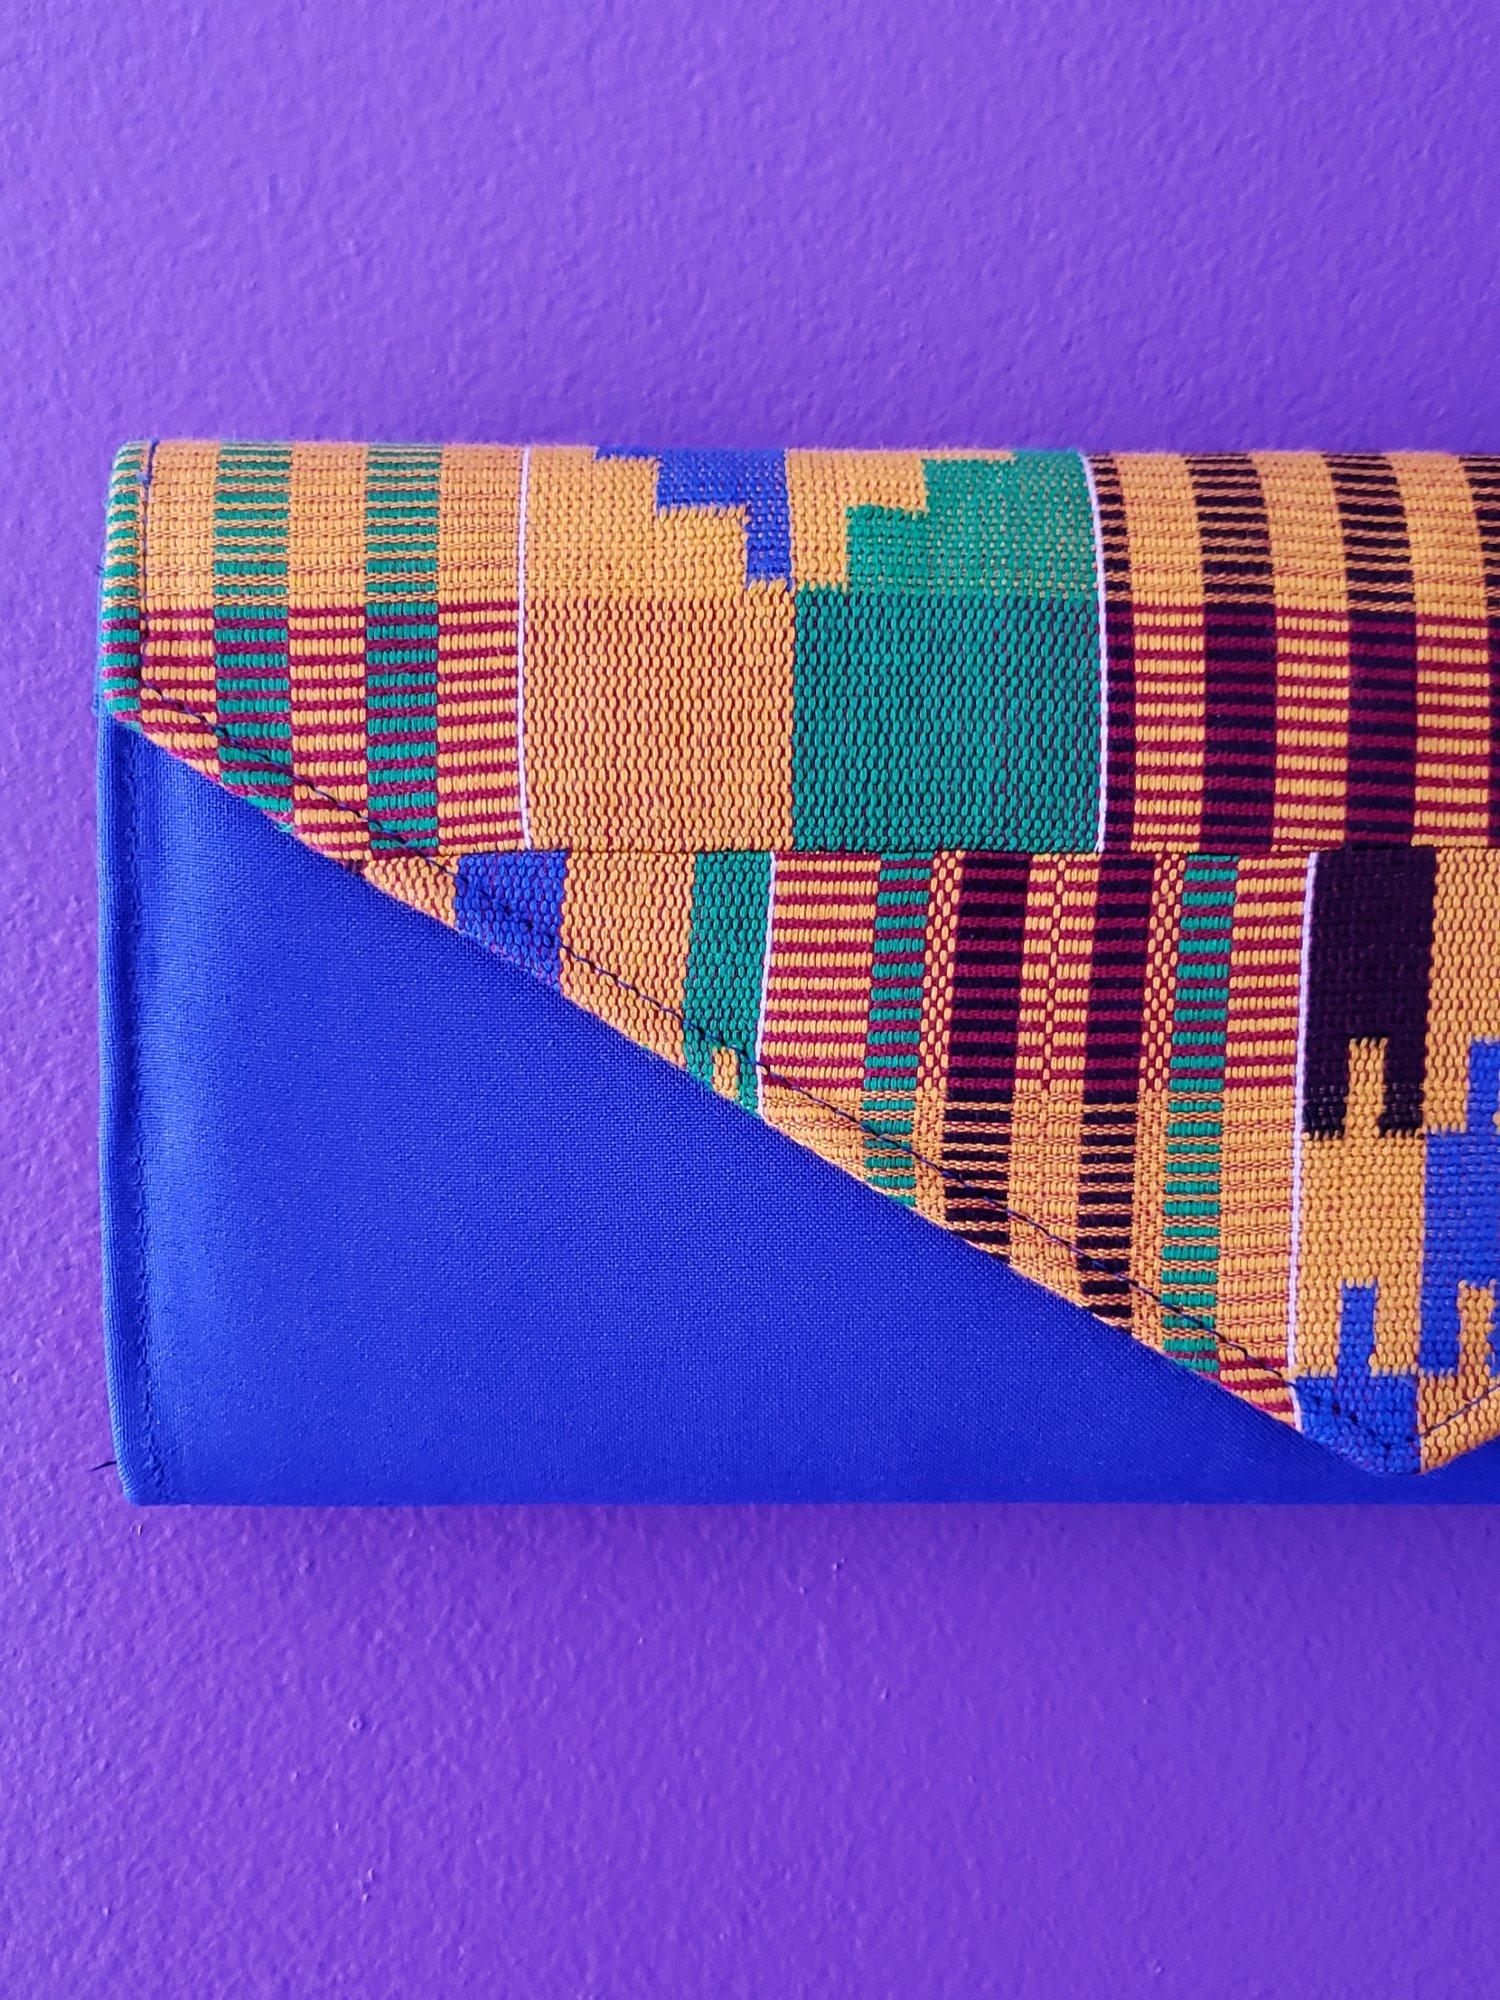 Image of Nkrumah Long Woven Clutch Bag